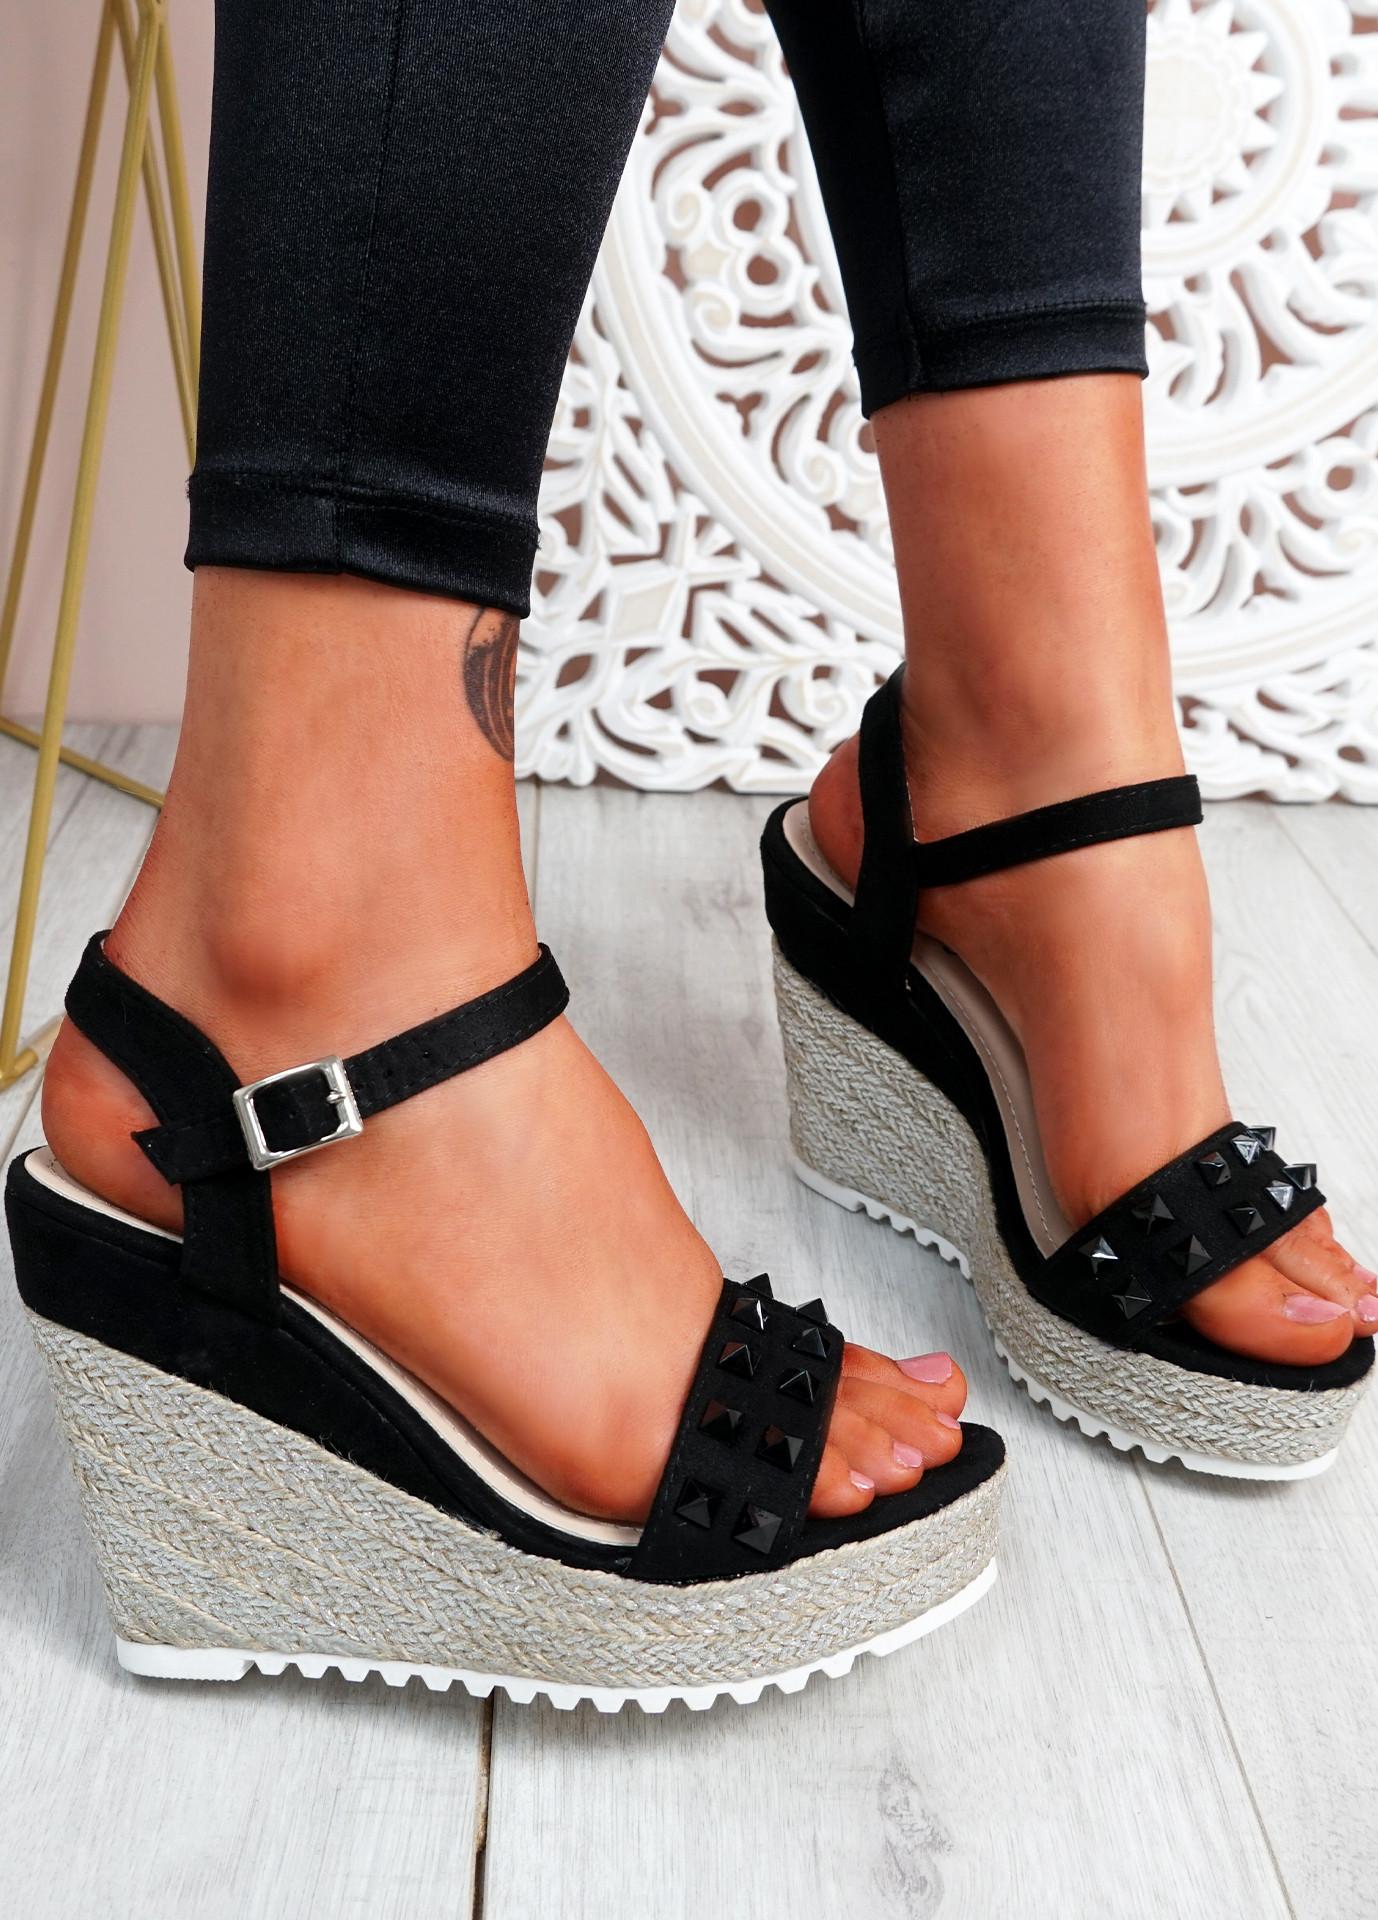 Anny Black Rock Studs Wedge Sandals